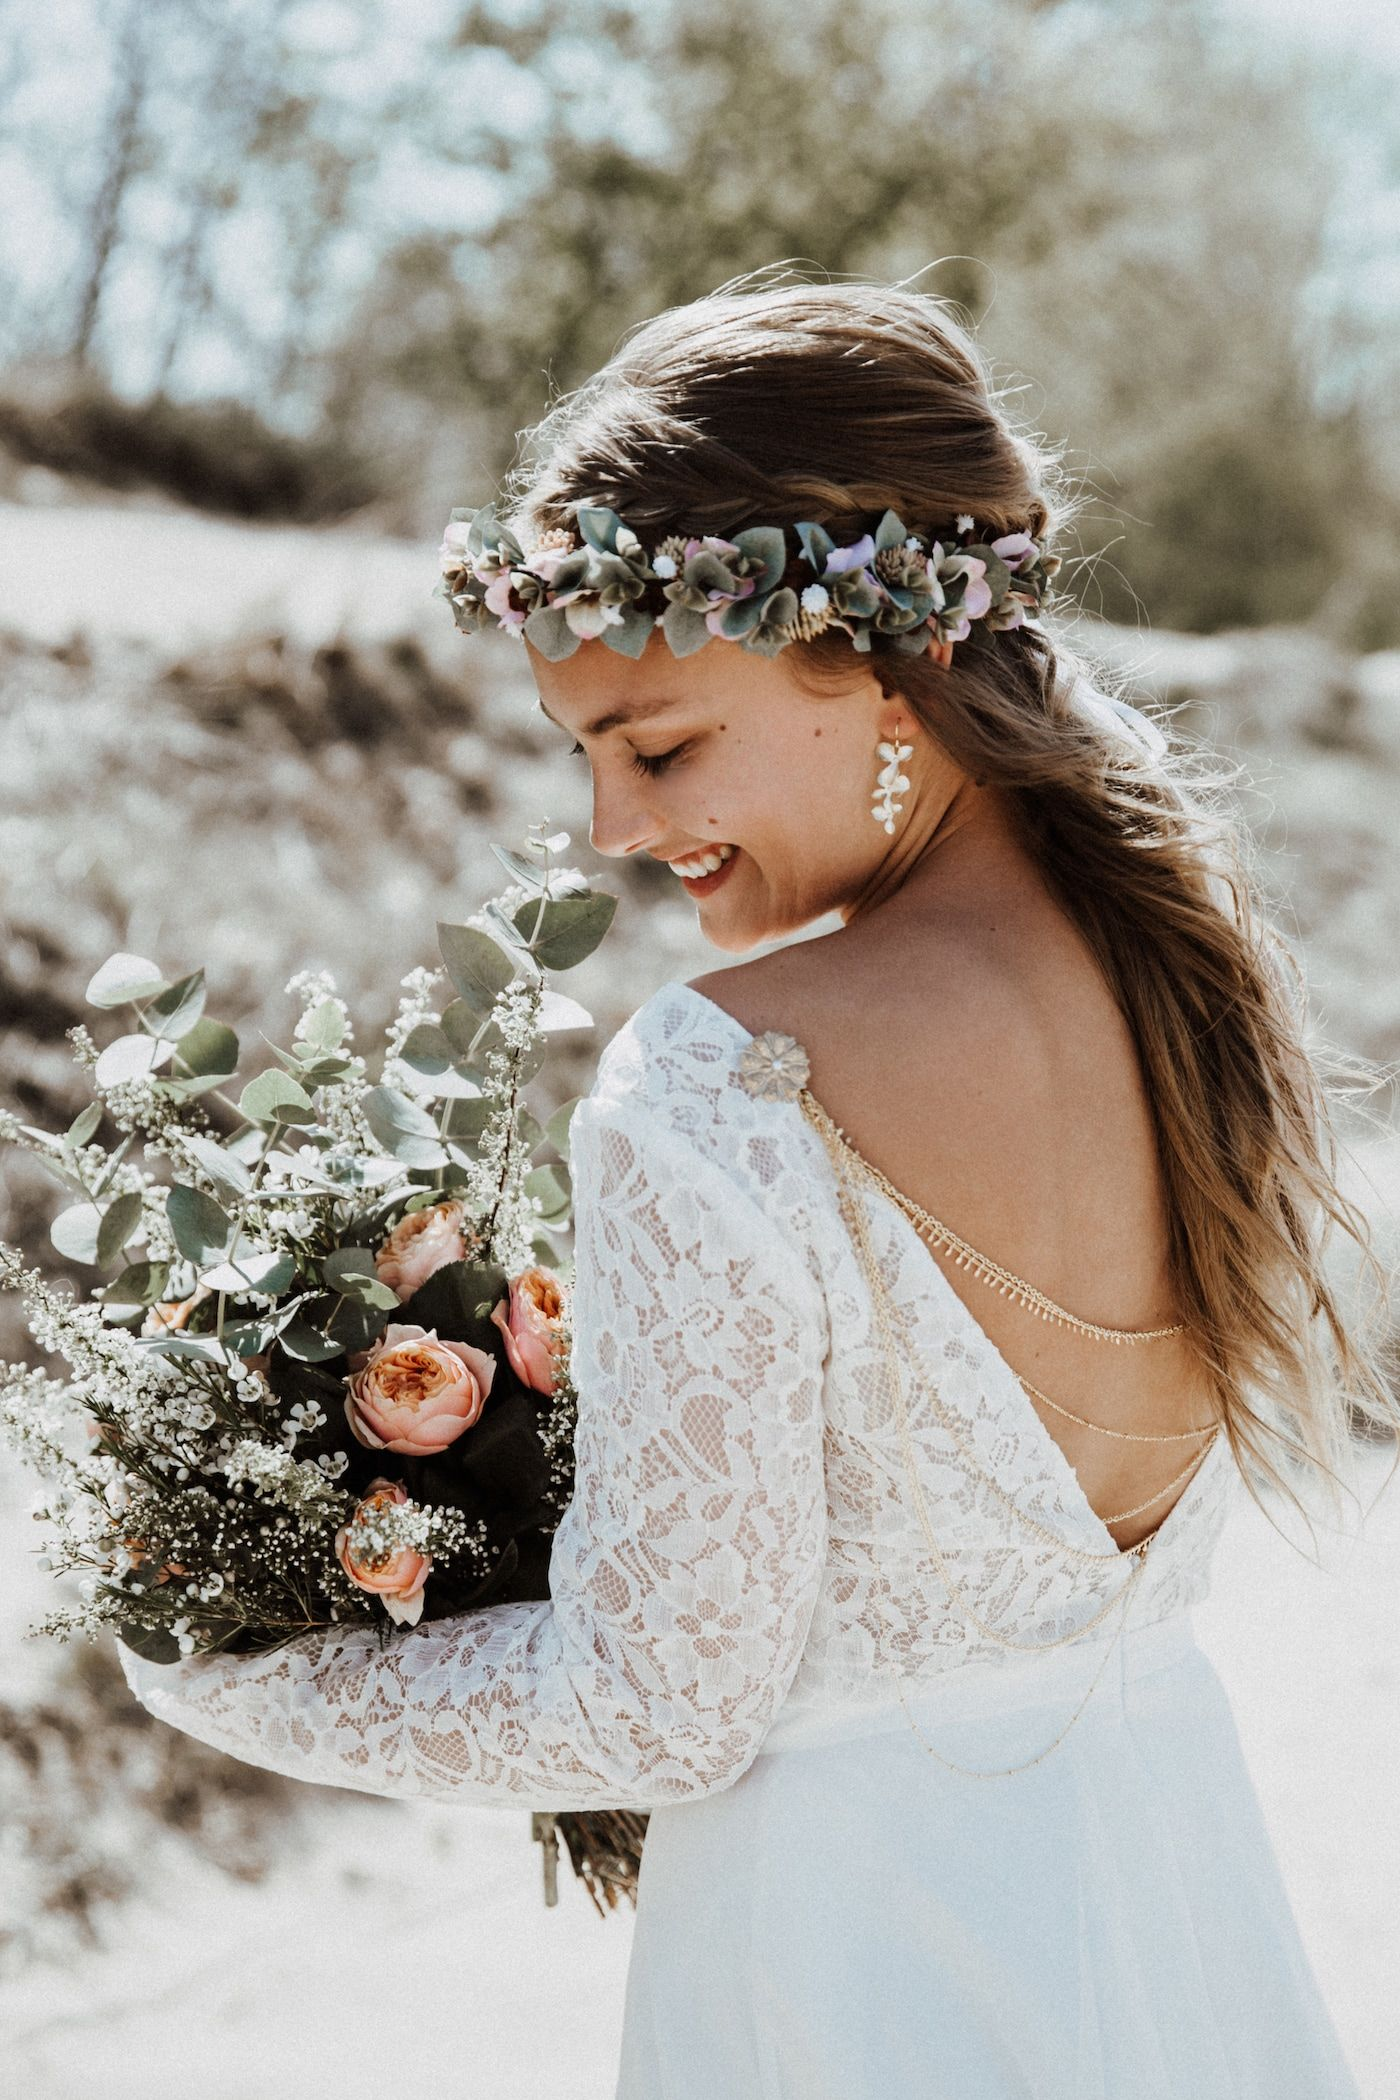 Blumenkranz im Boho-Stil